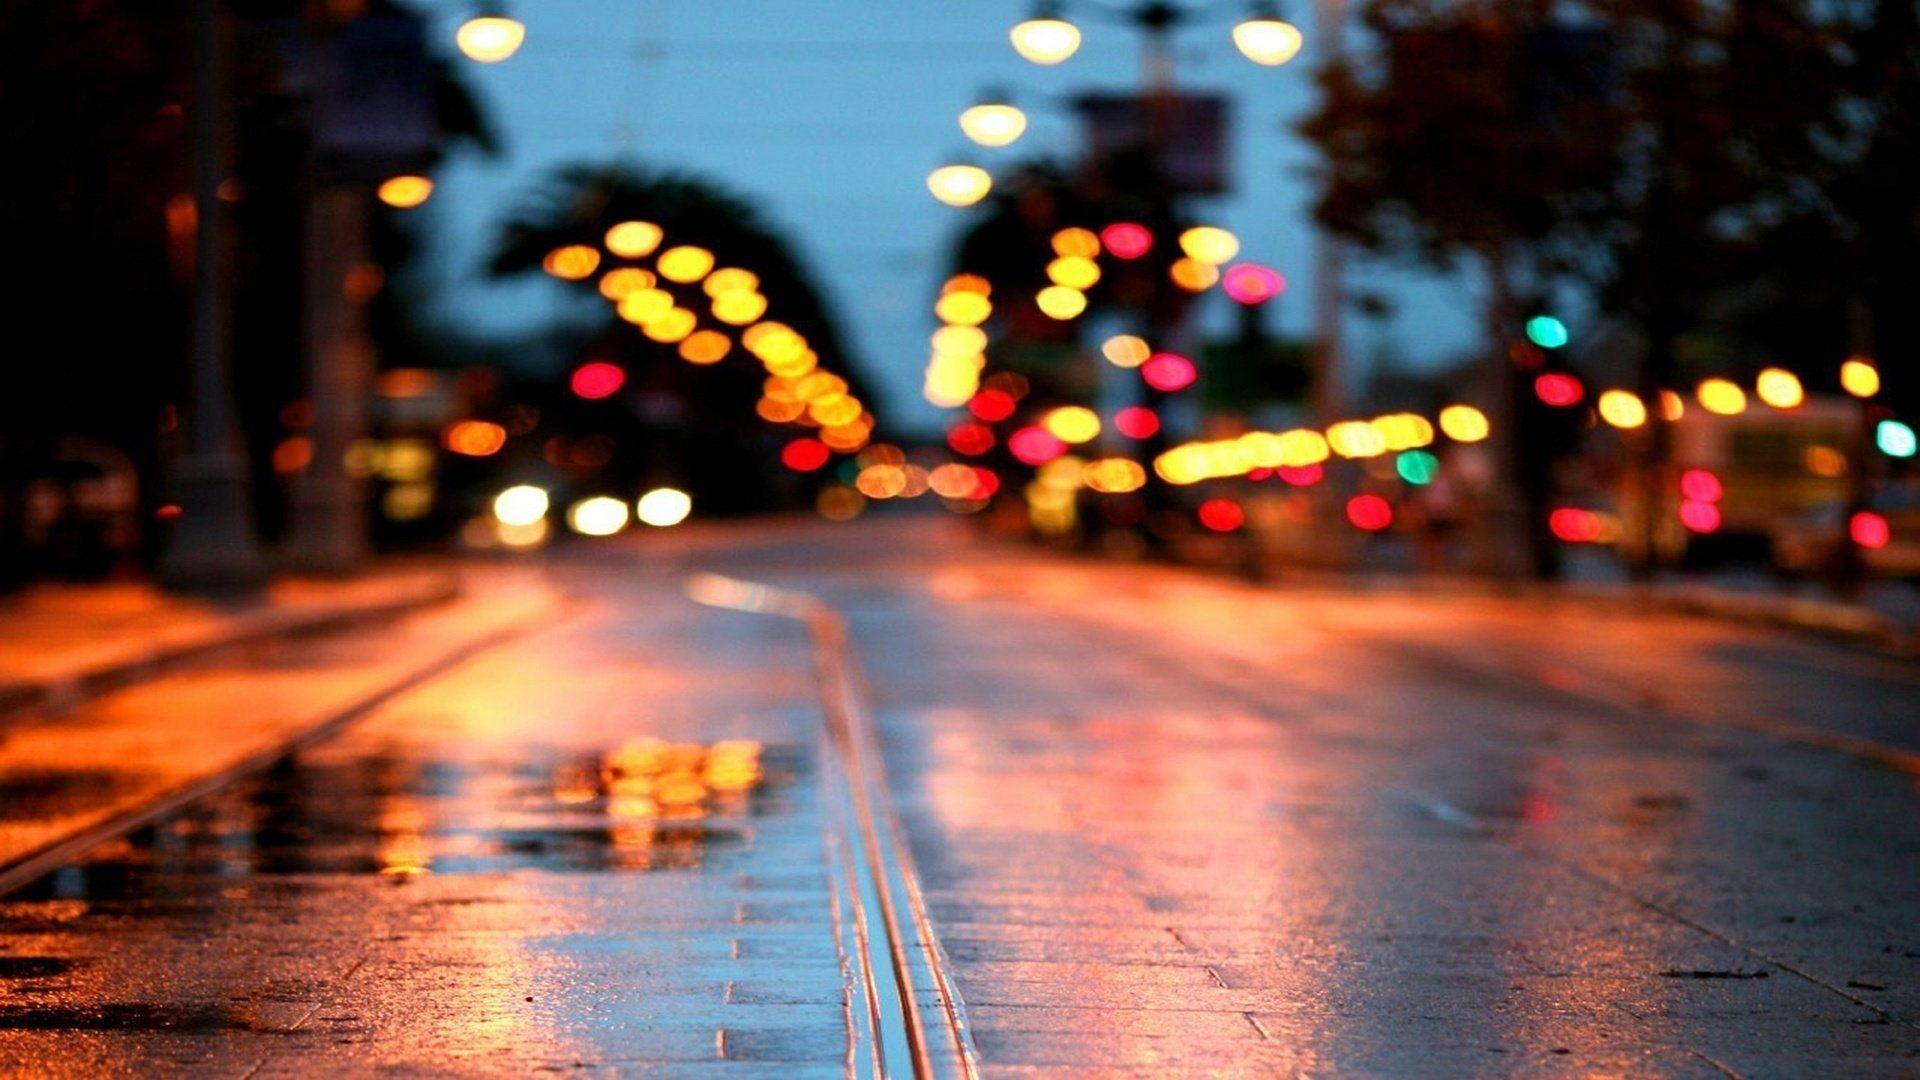 City Blur Wallpapers Top Free City Blur Backgrounds Wallpaperaccess Hd wallpaper lights blur city glare